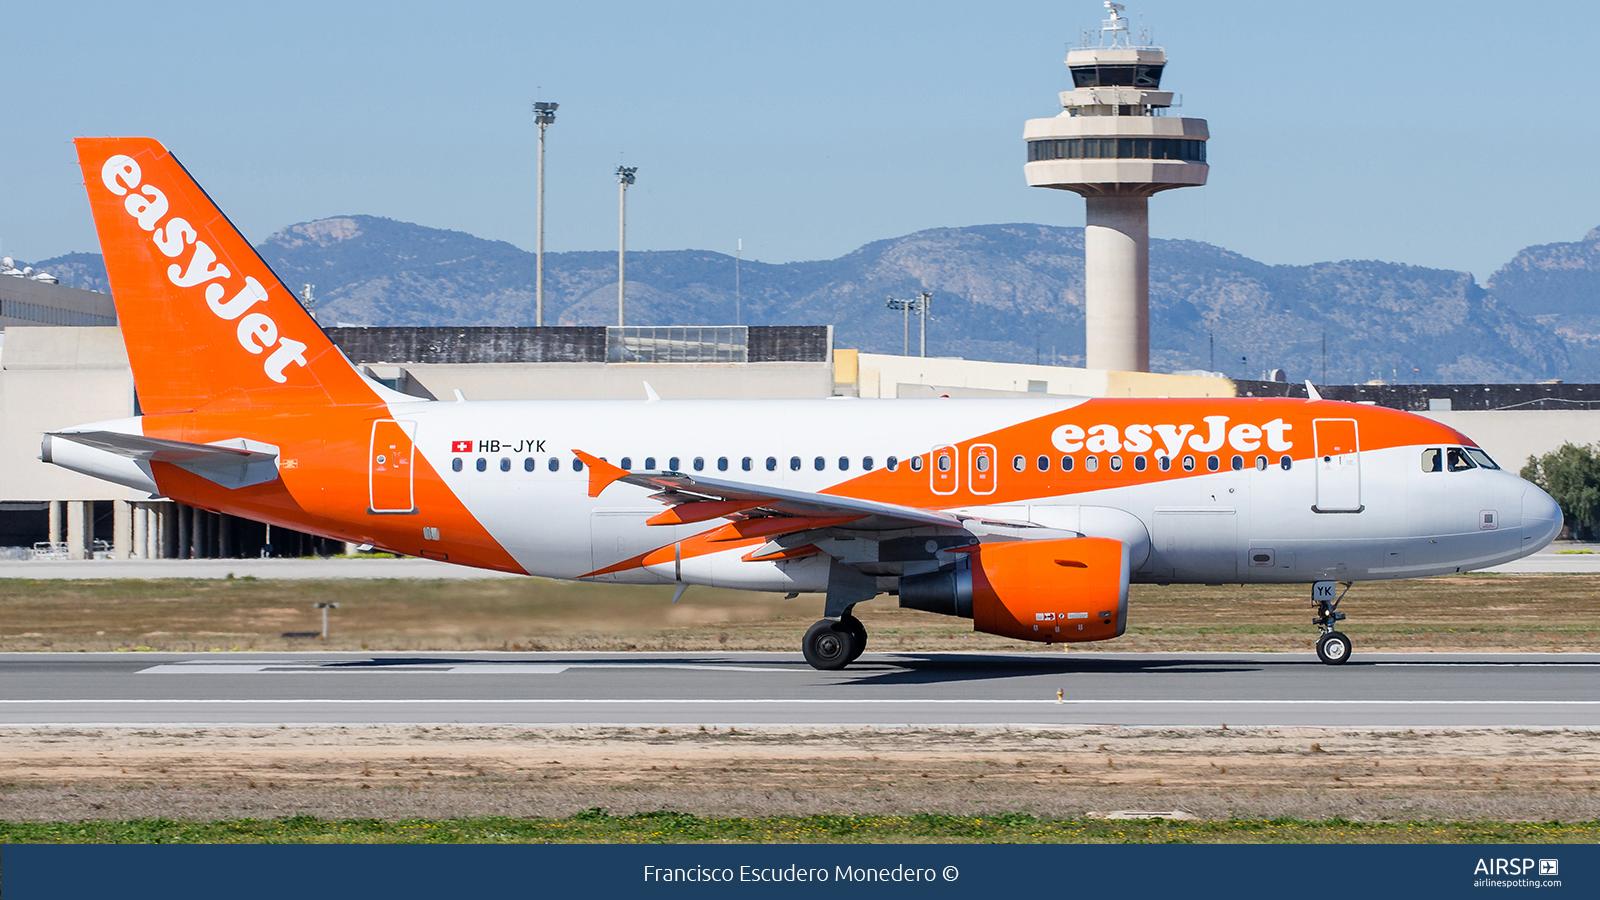 Easyjet  Airbus A319  HB-JYK